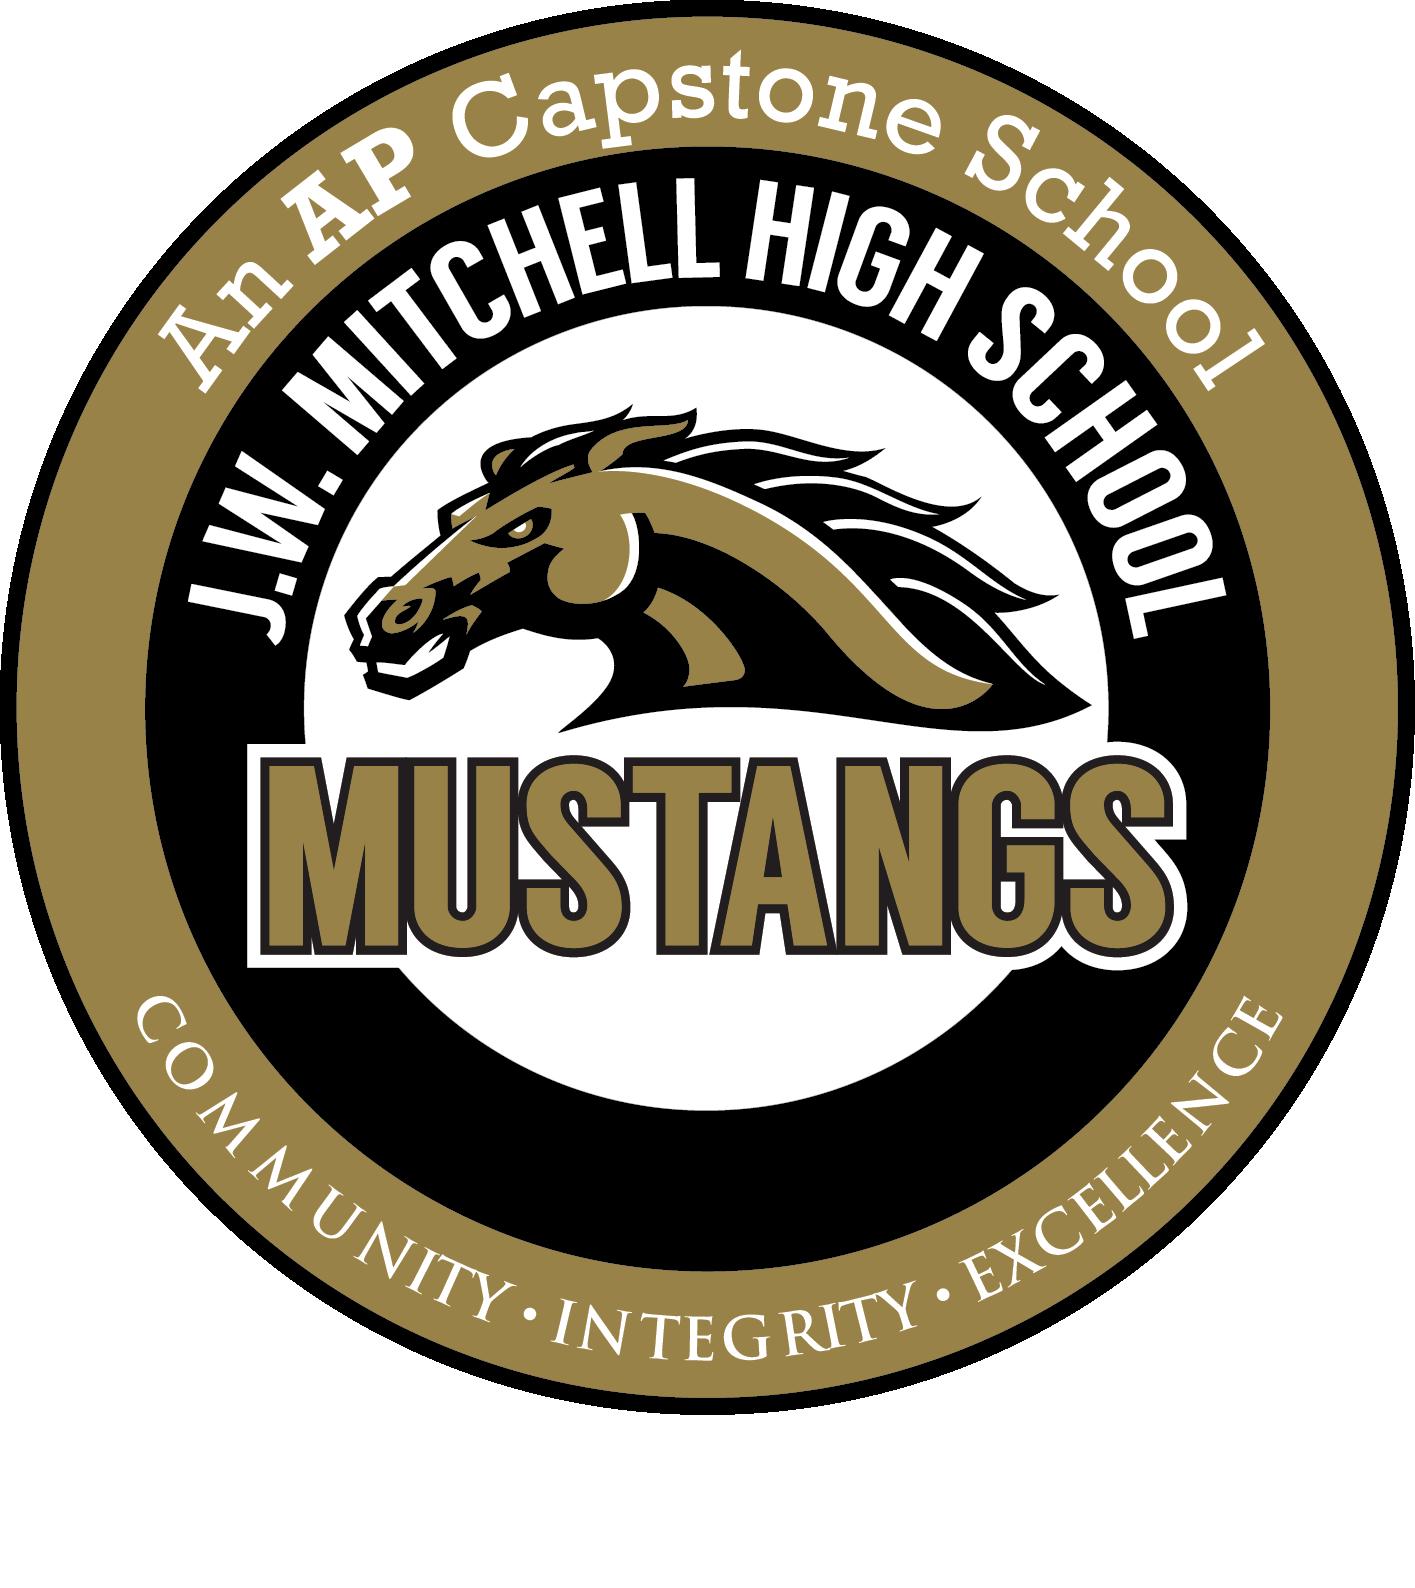 J.W. Mitchell High School - An AP Capstone School